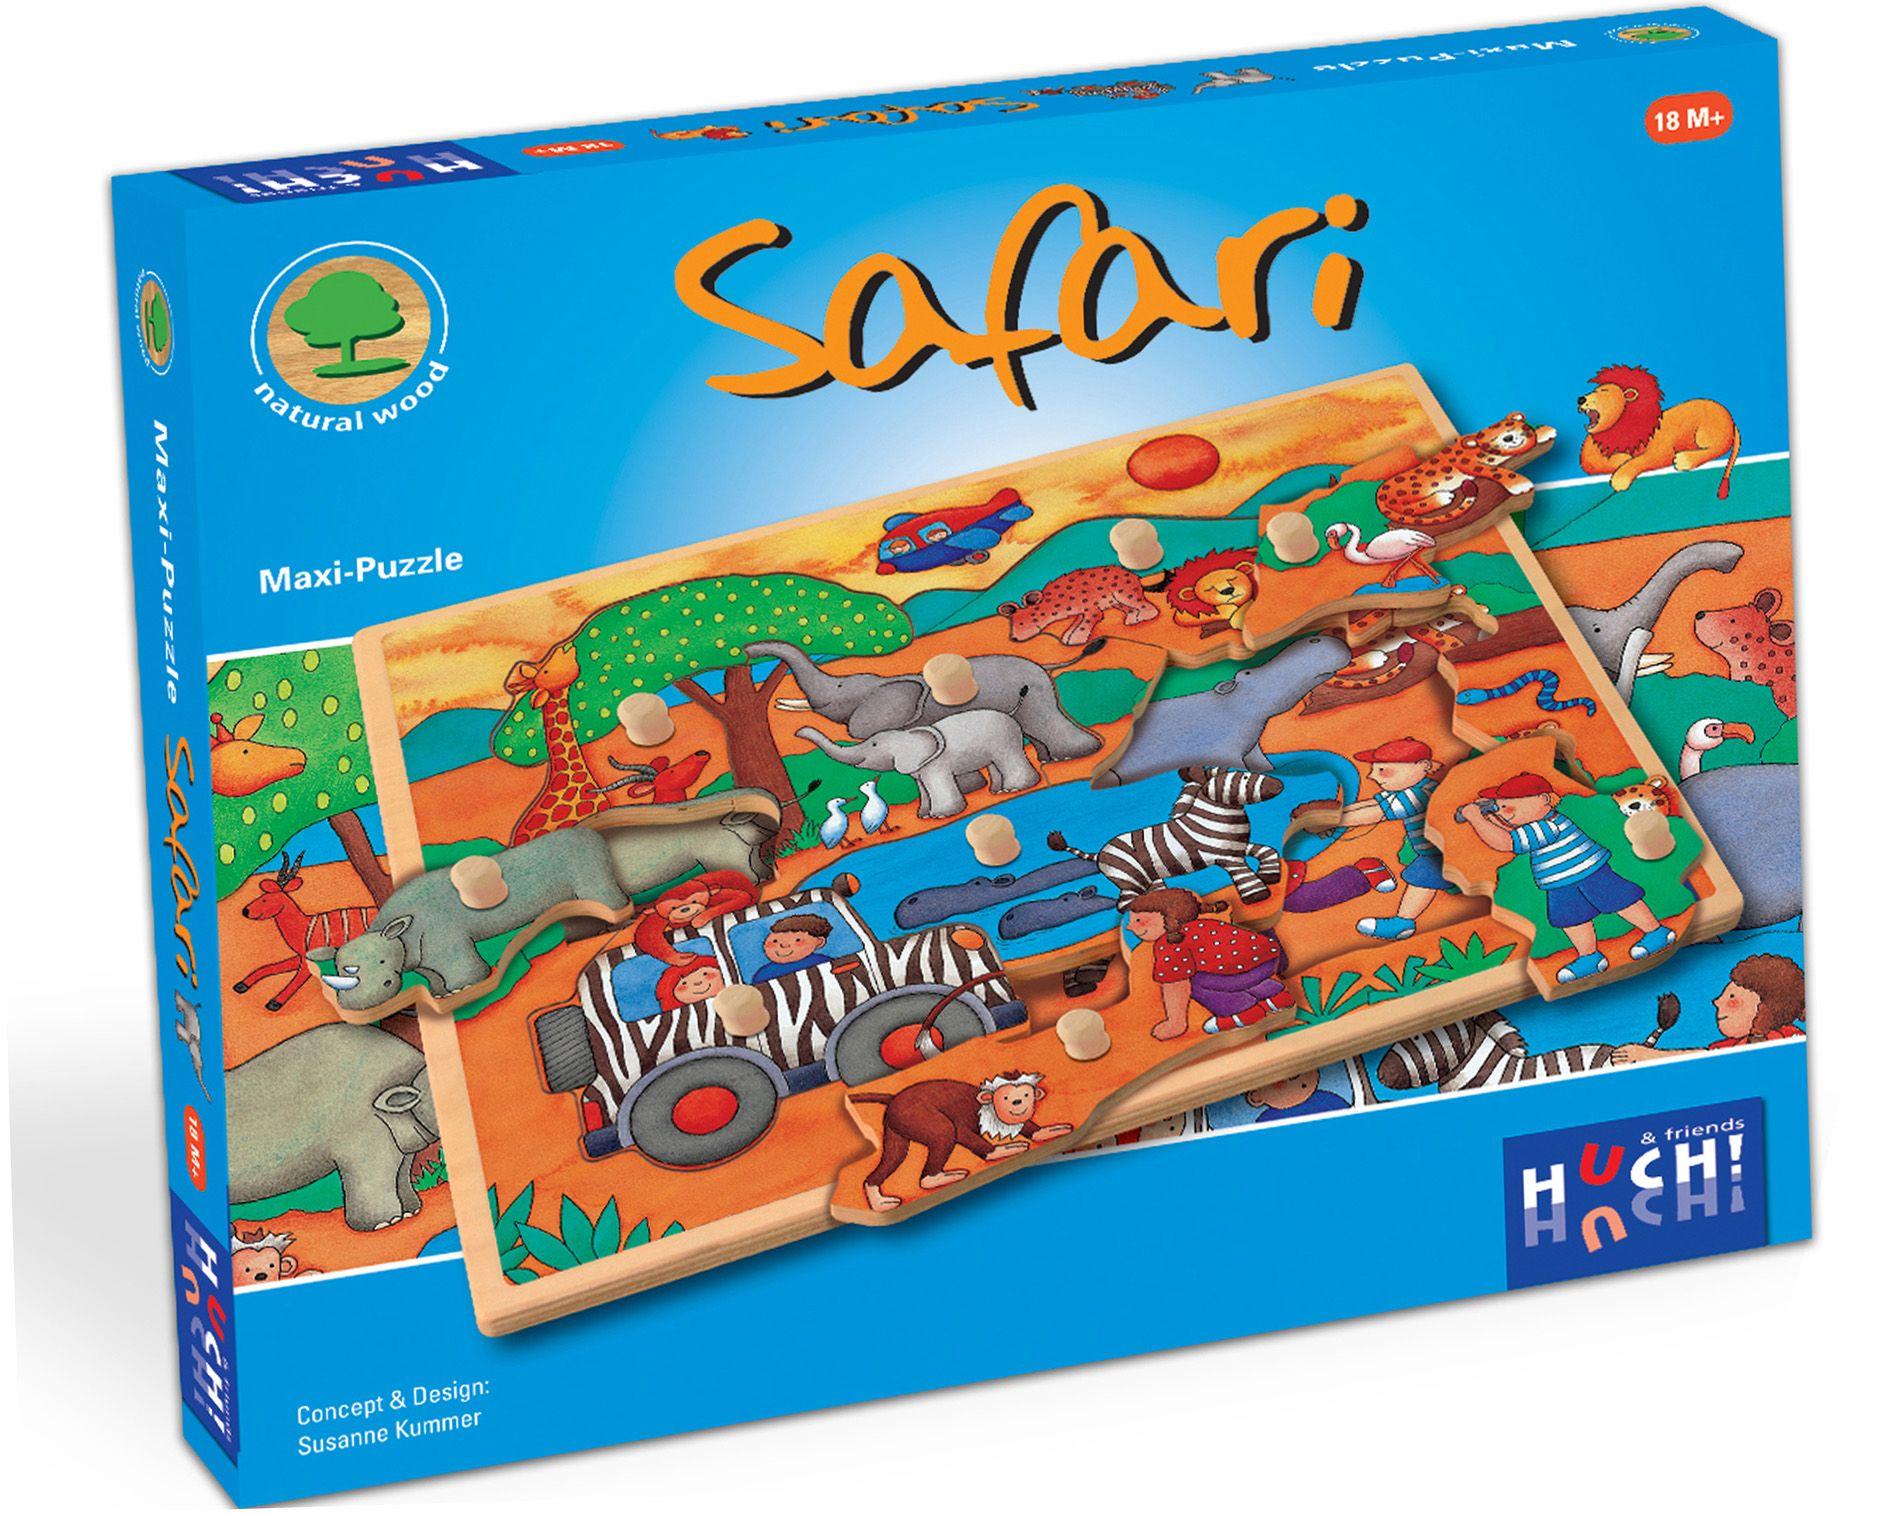 HUCH FRIENDS Huch! & friends Puzzle, 9 Maxi-Teile, »Wooden Line Safari«